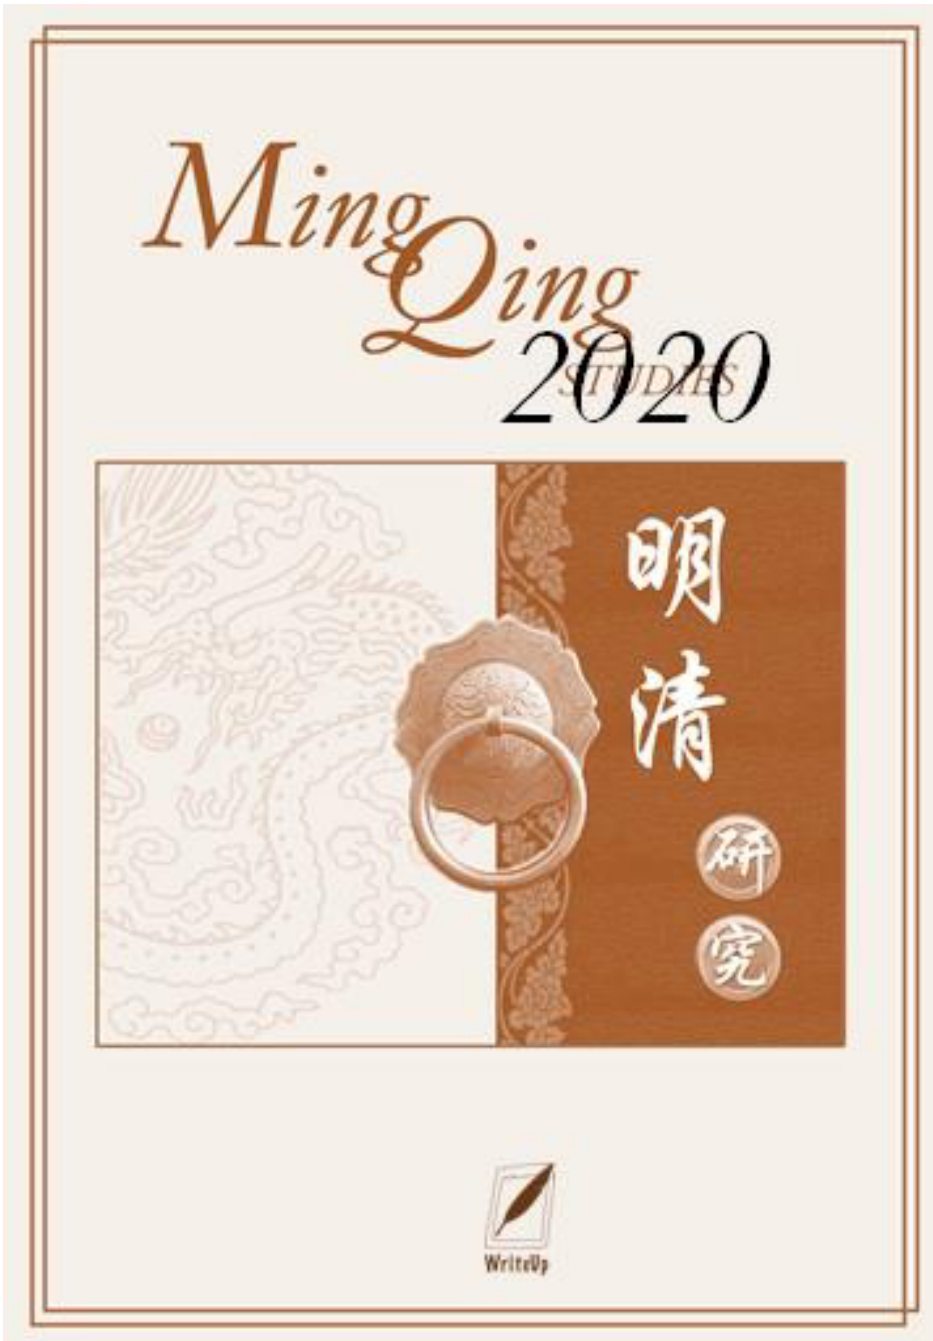 copertina ming qing